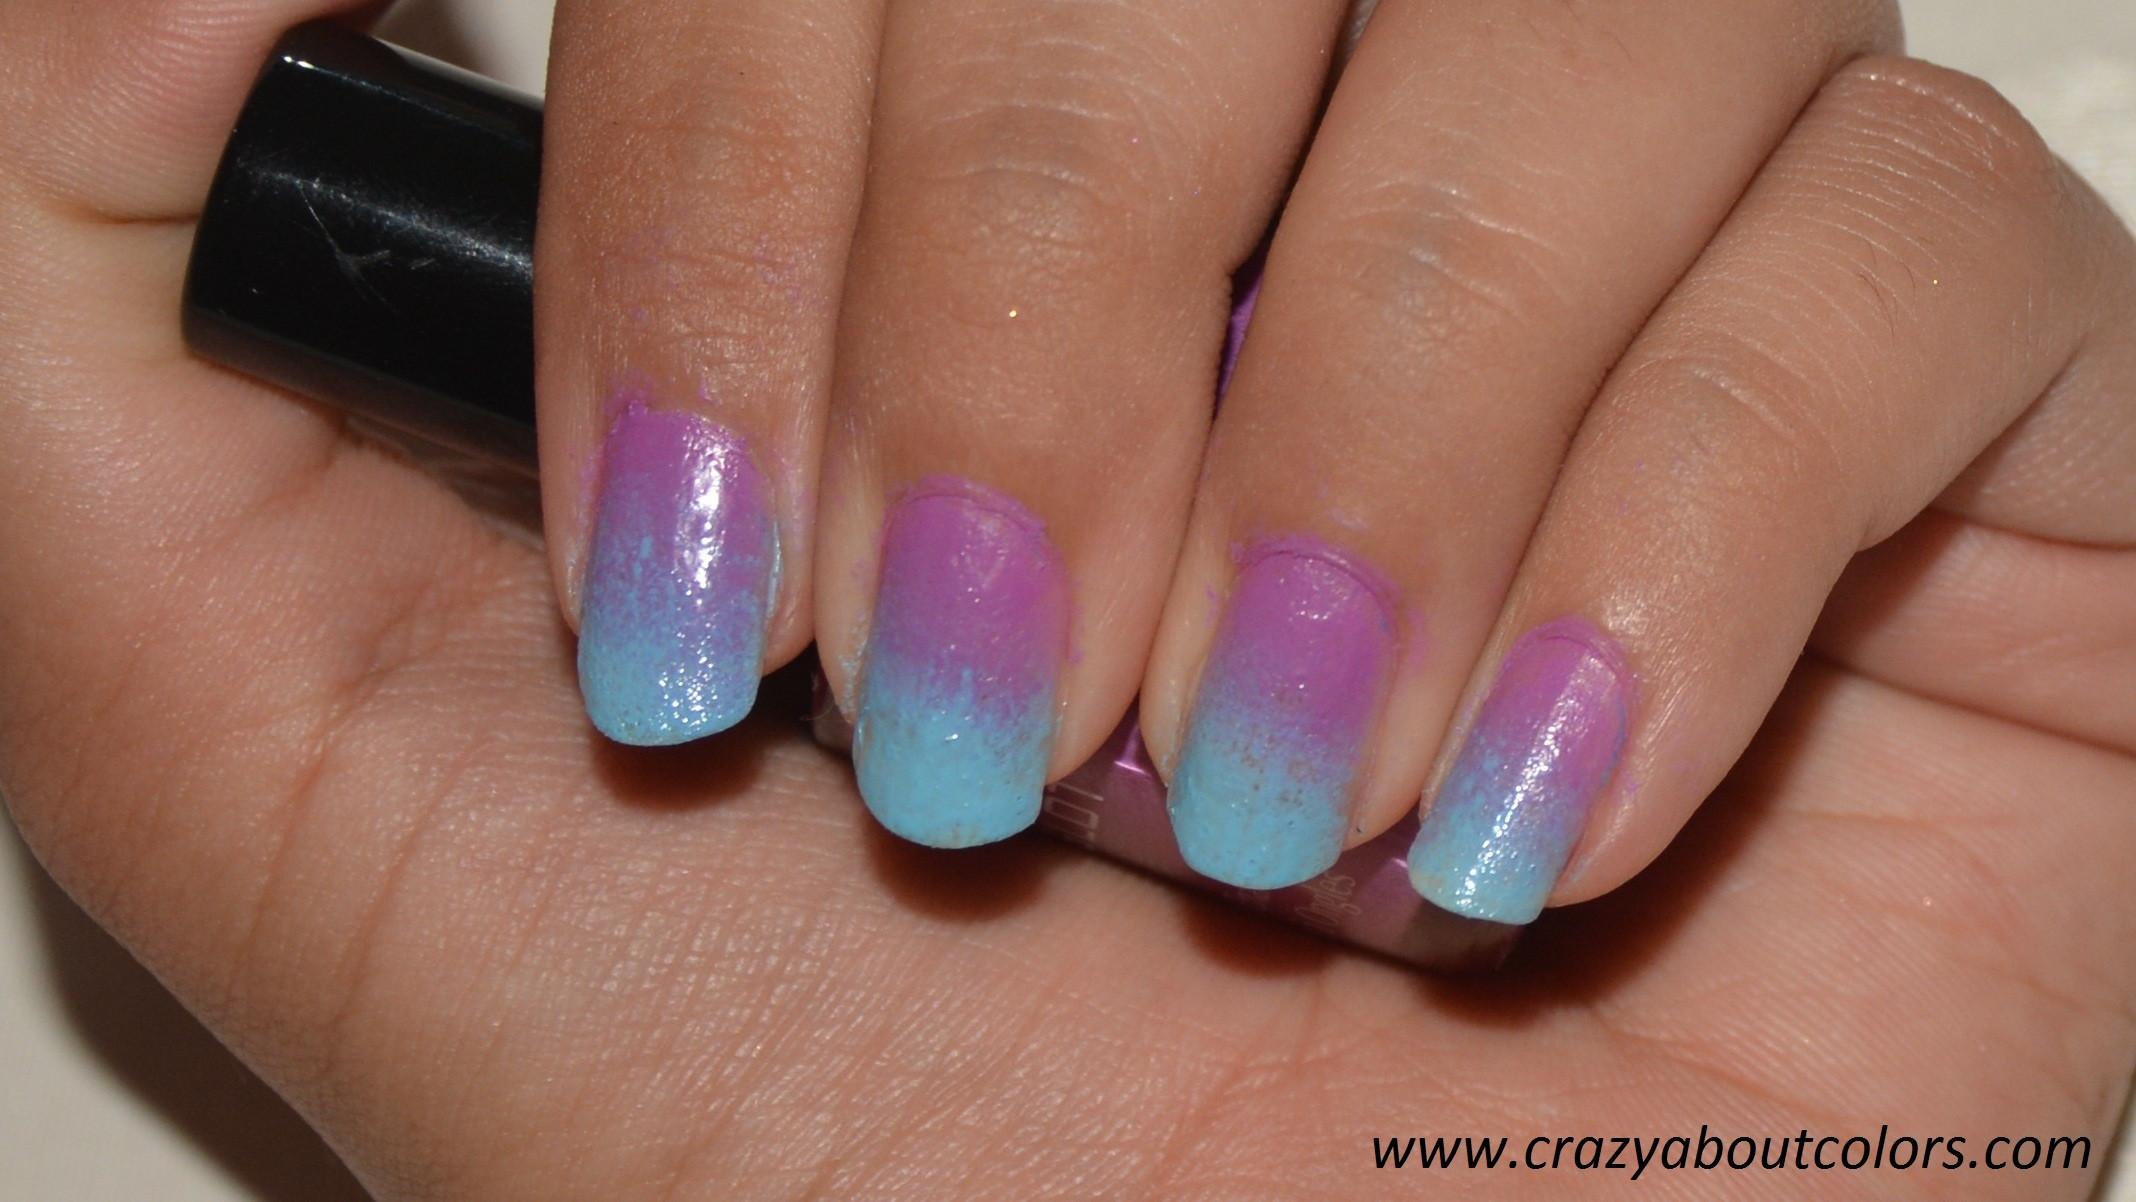 Ombre Nail Colors  Ombre Nails Crazy about Colors